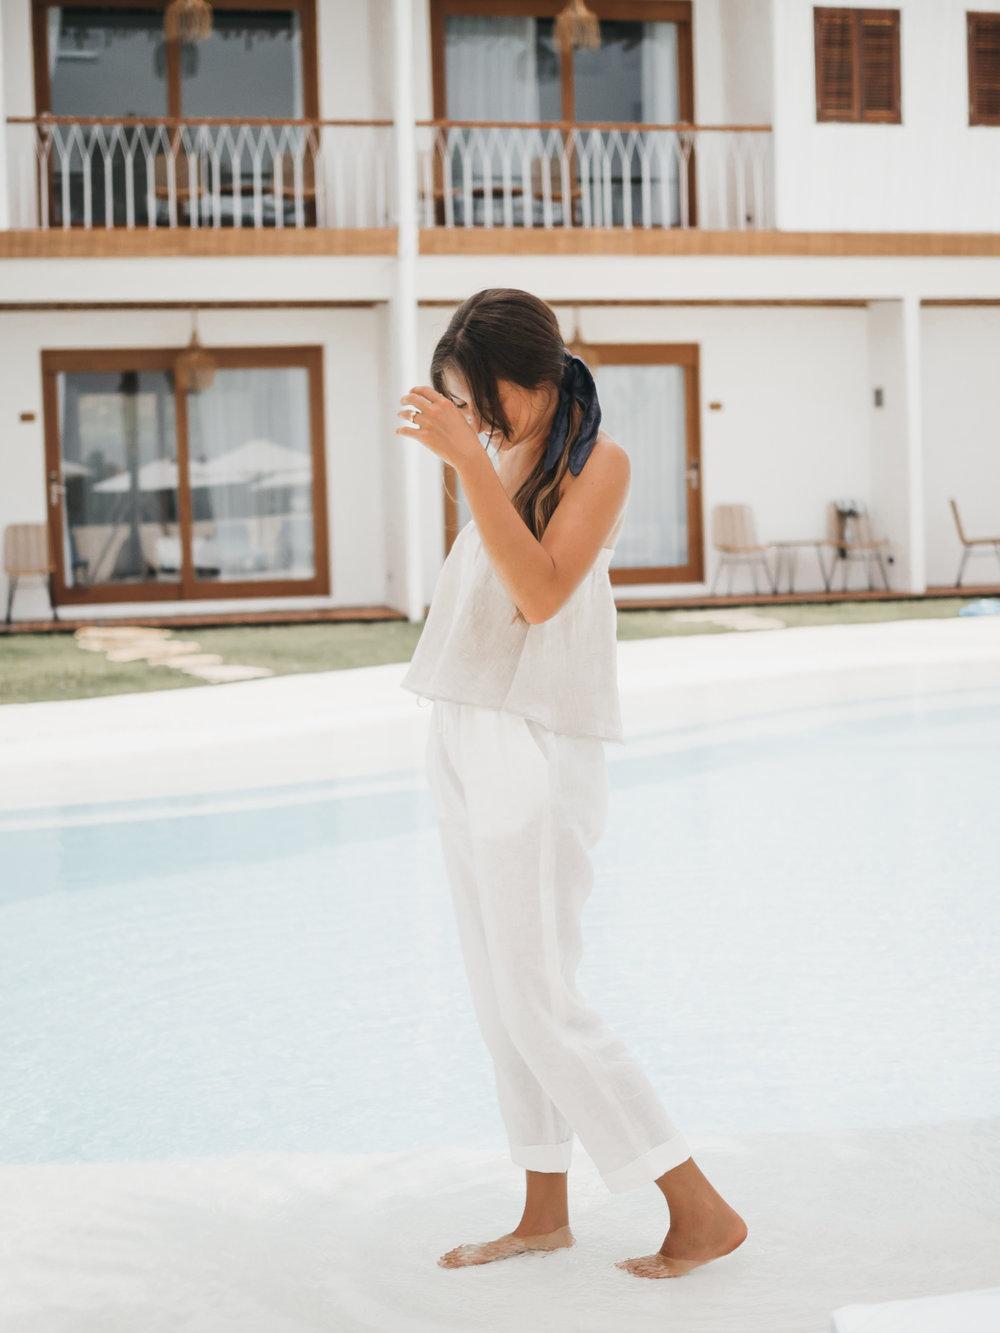 keira_mason+Vegan_resort_wear-22.jpg